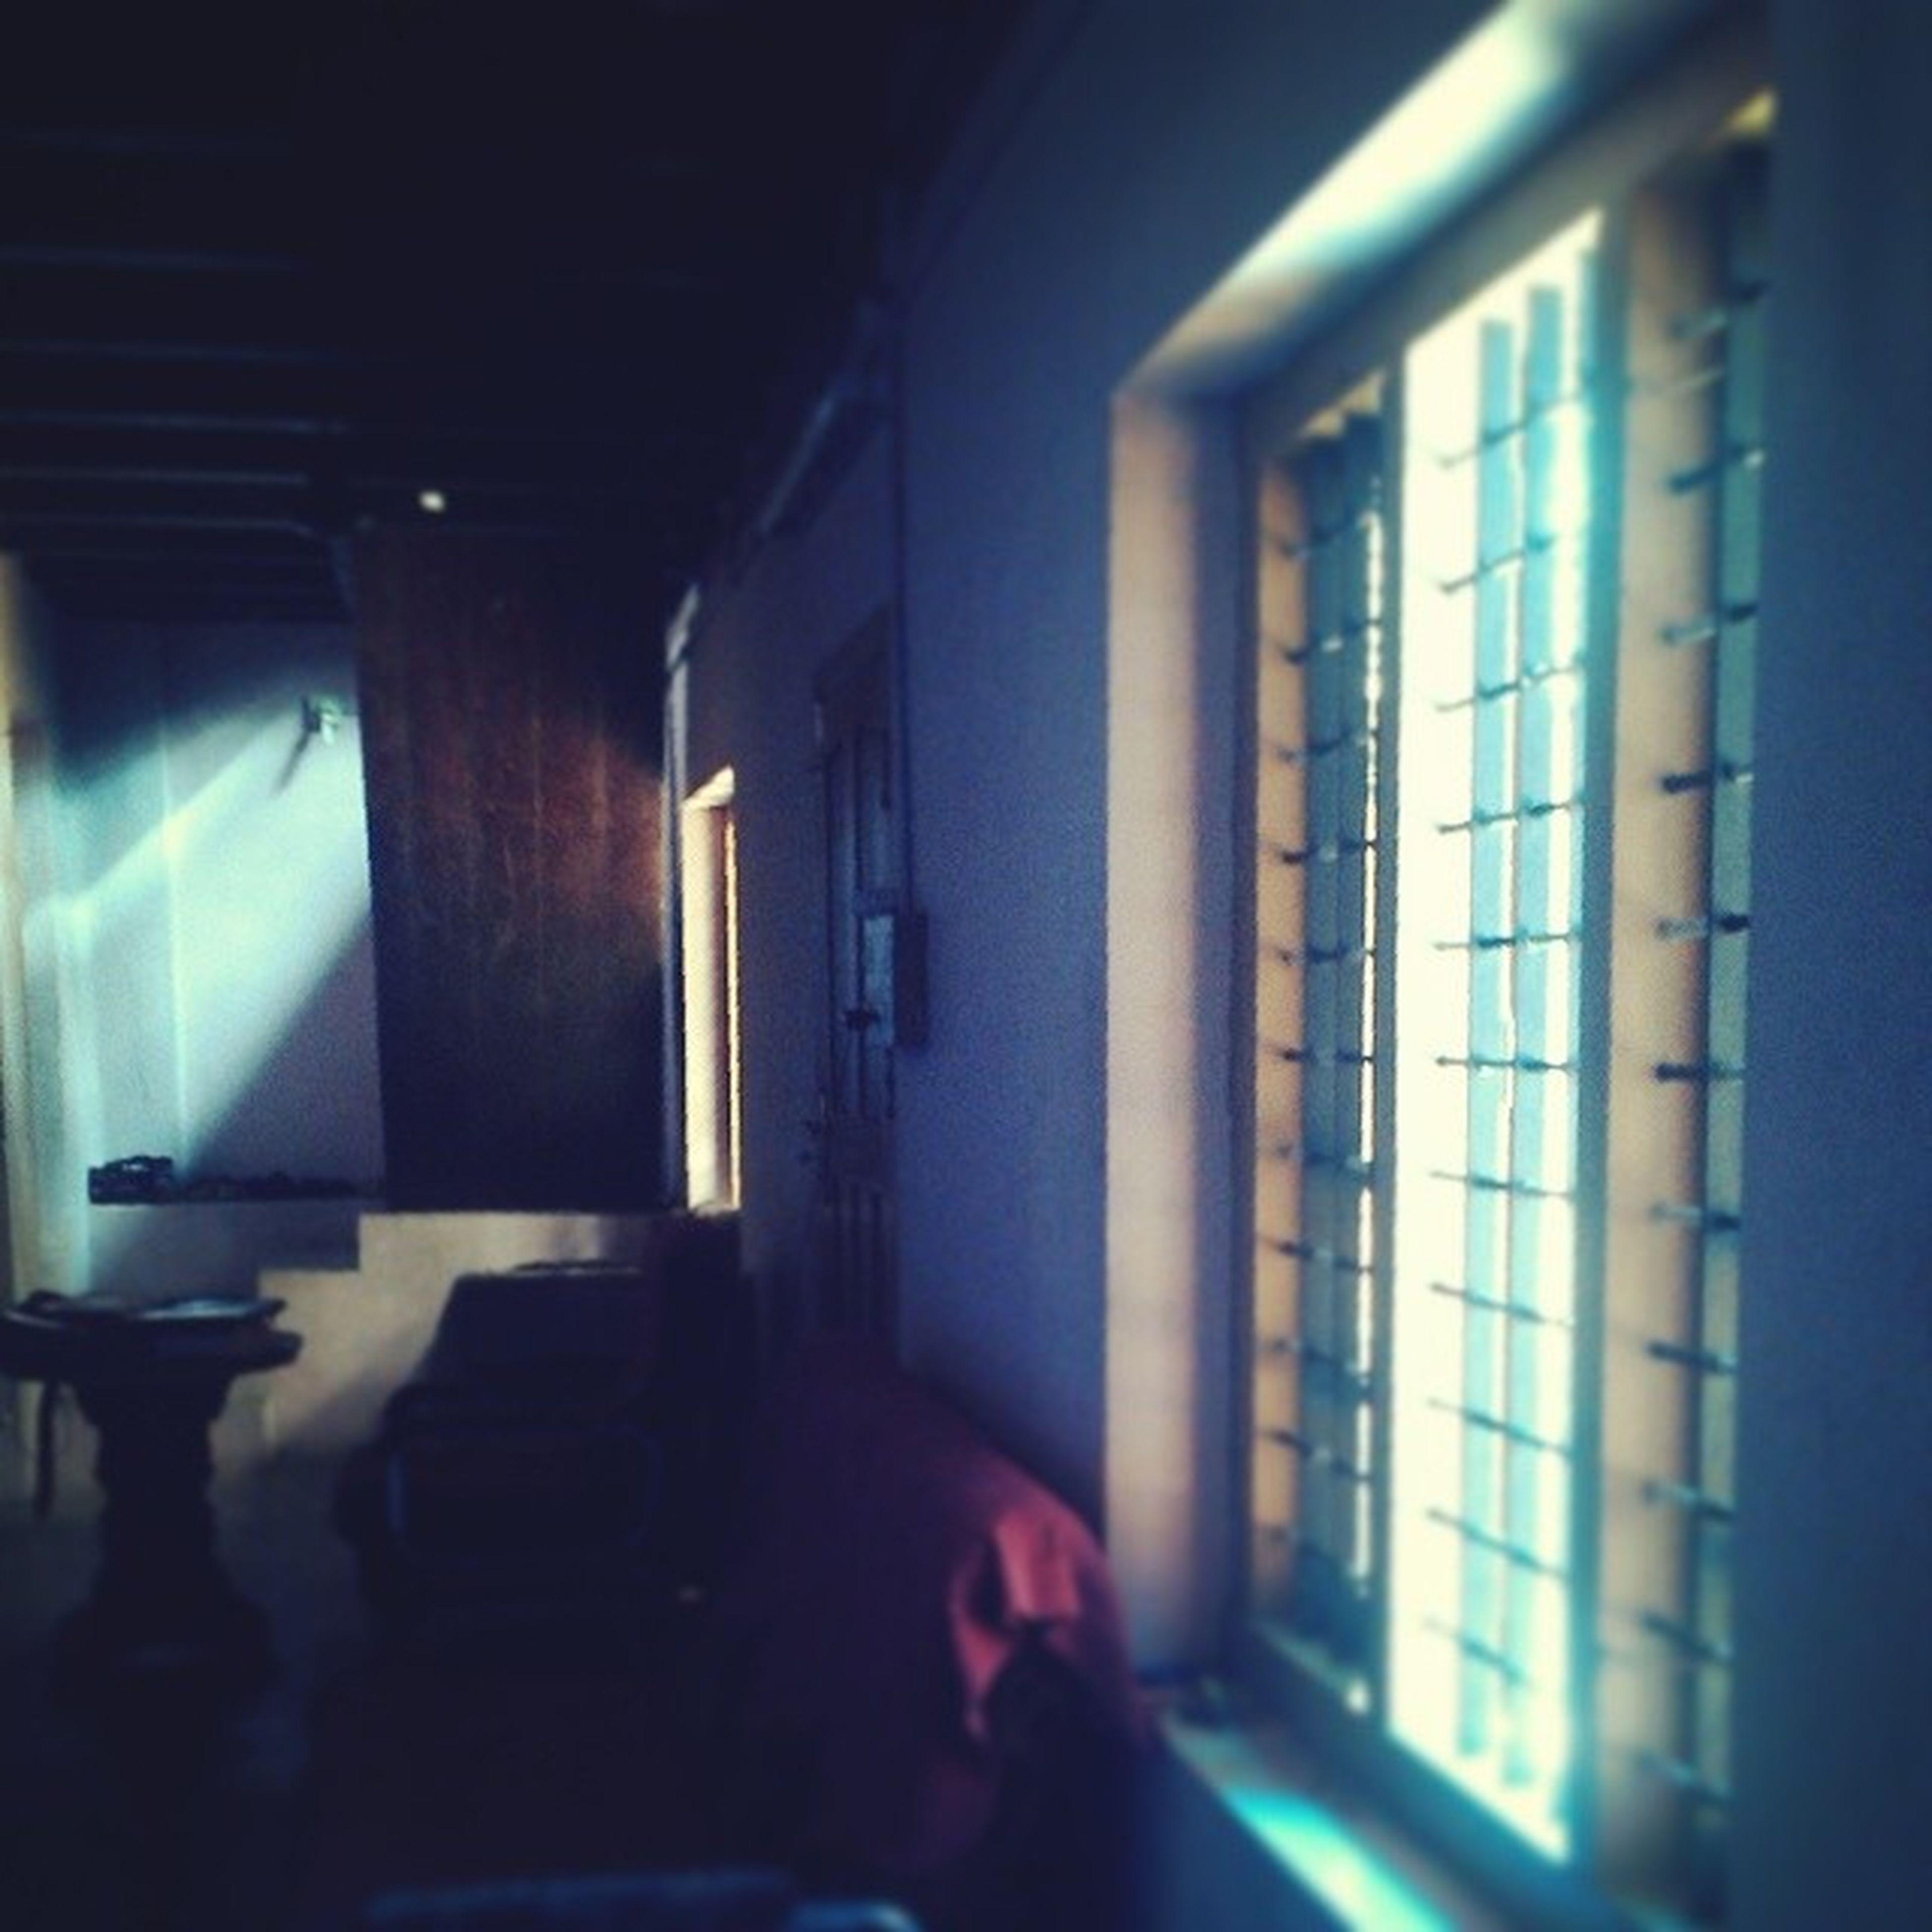 indoors, window, empty, absence, illuminated, interior, architecture, home interior, built structure, chair, room, domestic room, corridor, door, no people, sunlight, lighting equipment, house, dark, flooring